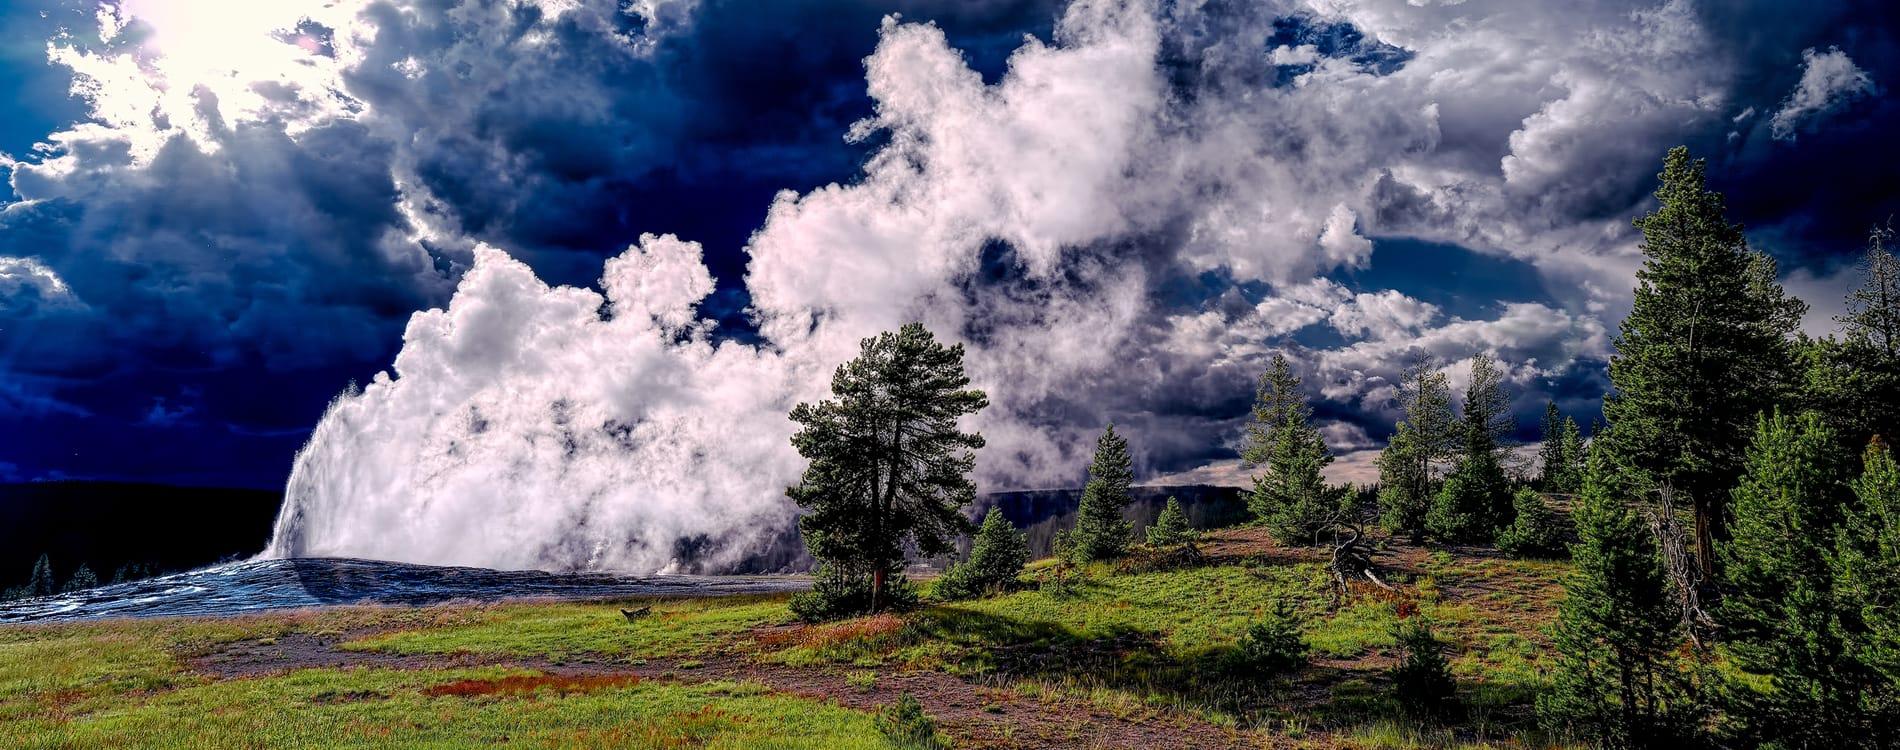 West Yellowstone - Old Faithful Geyser Yellowstone National Park